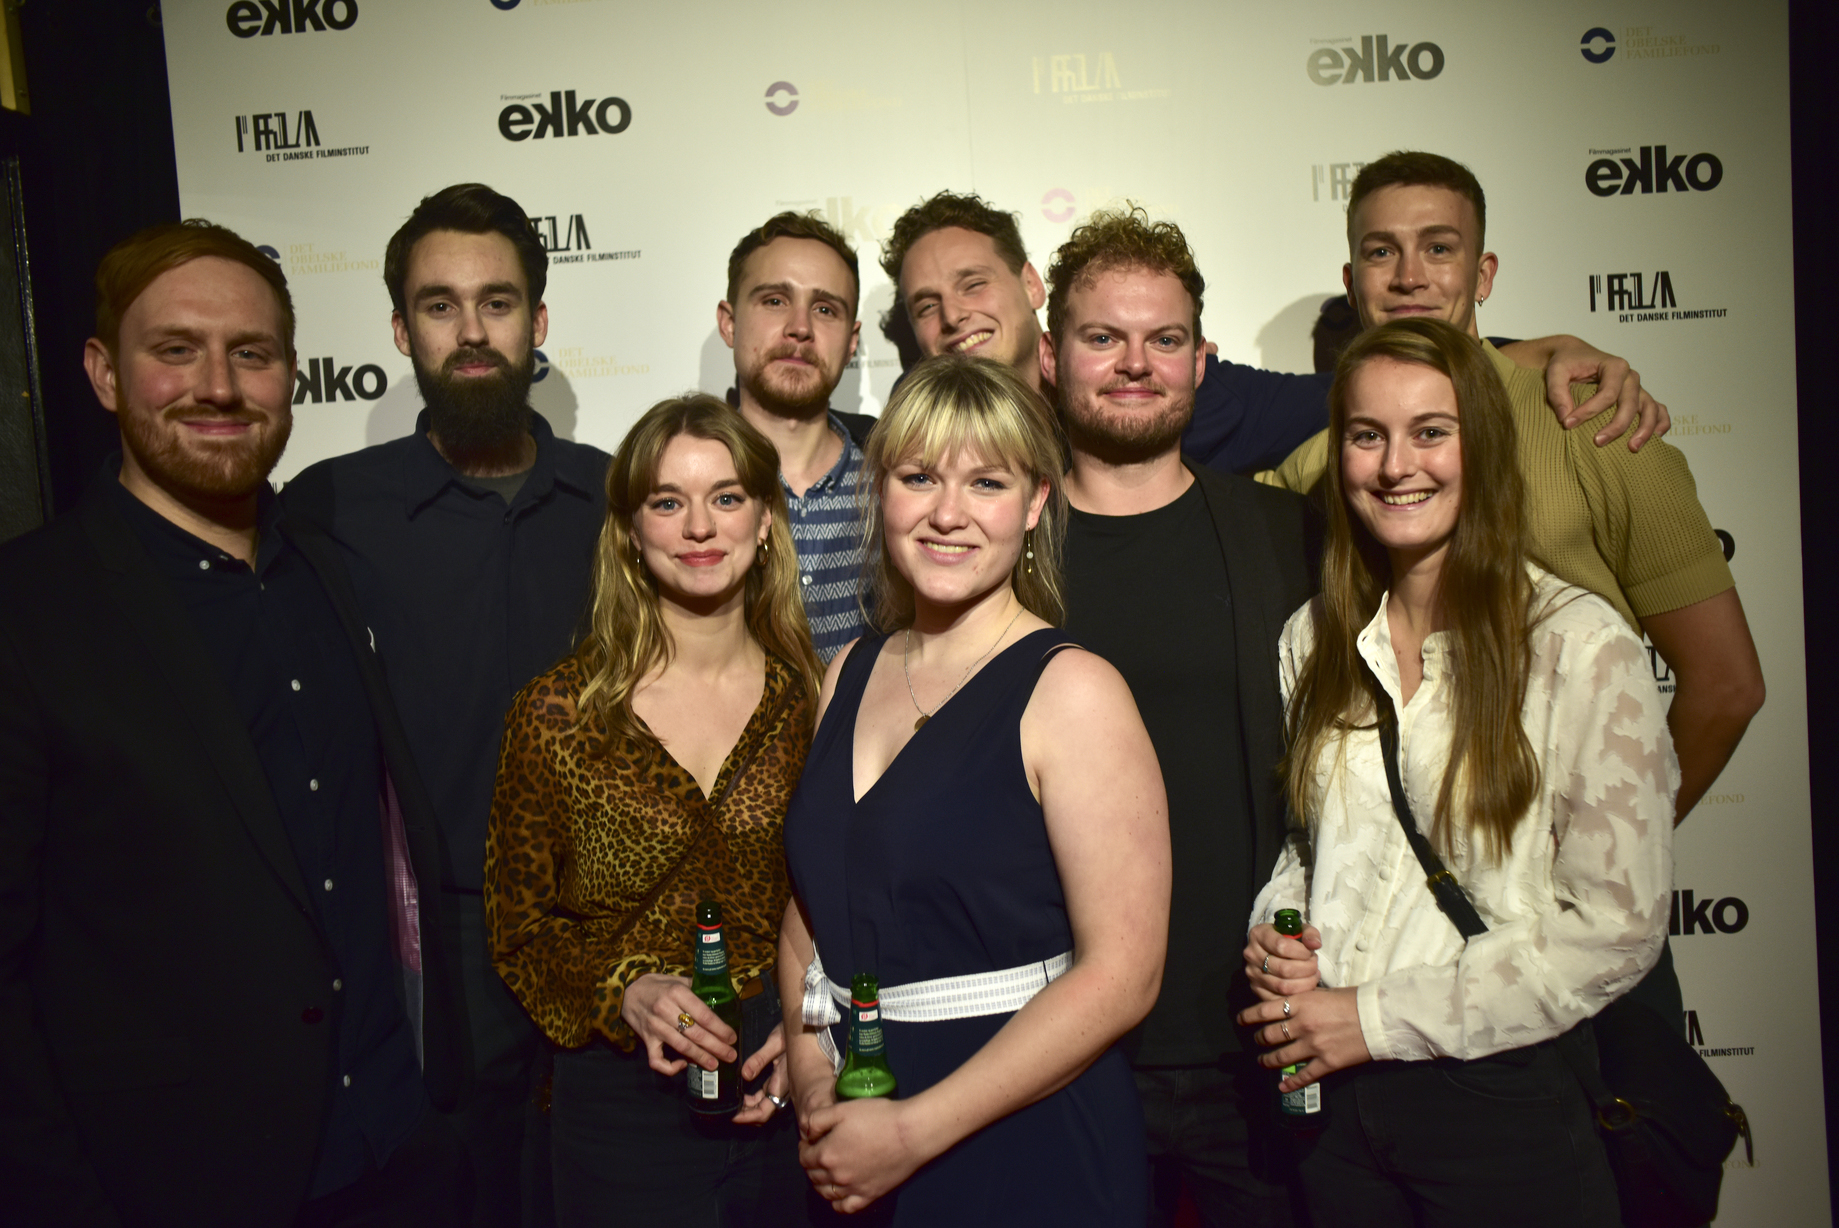 Danske kvindelige skuespillere Halv løn